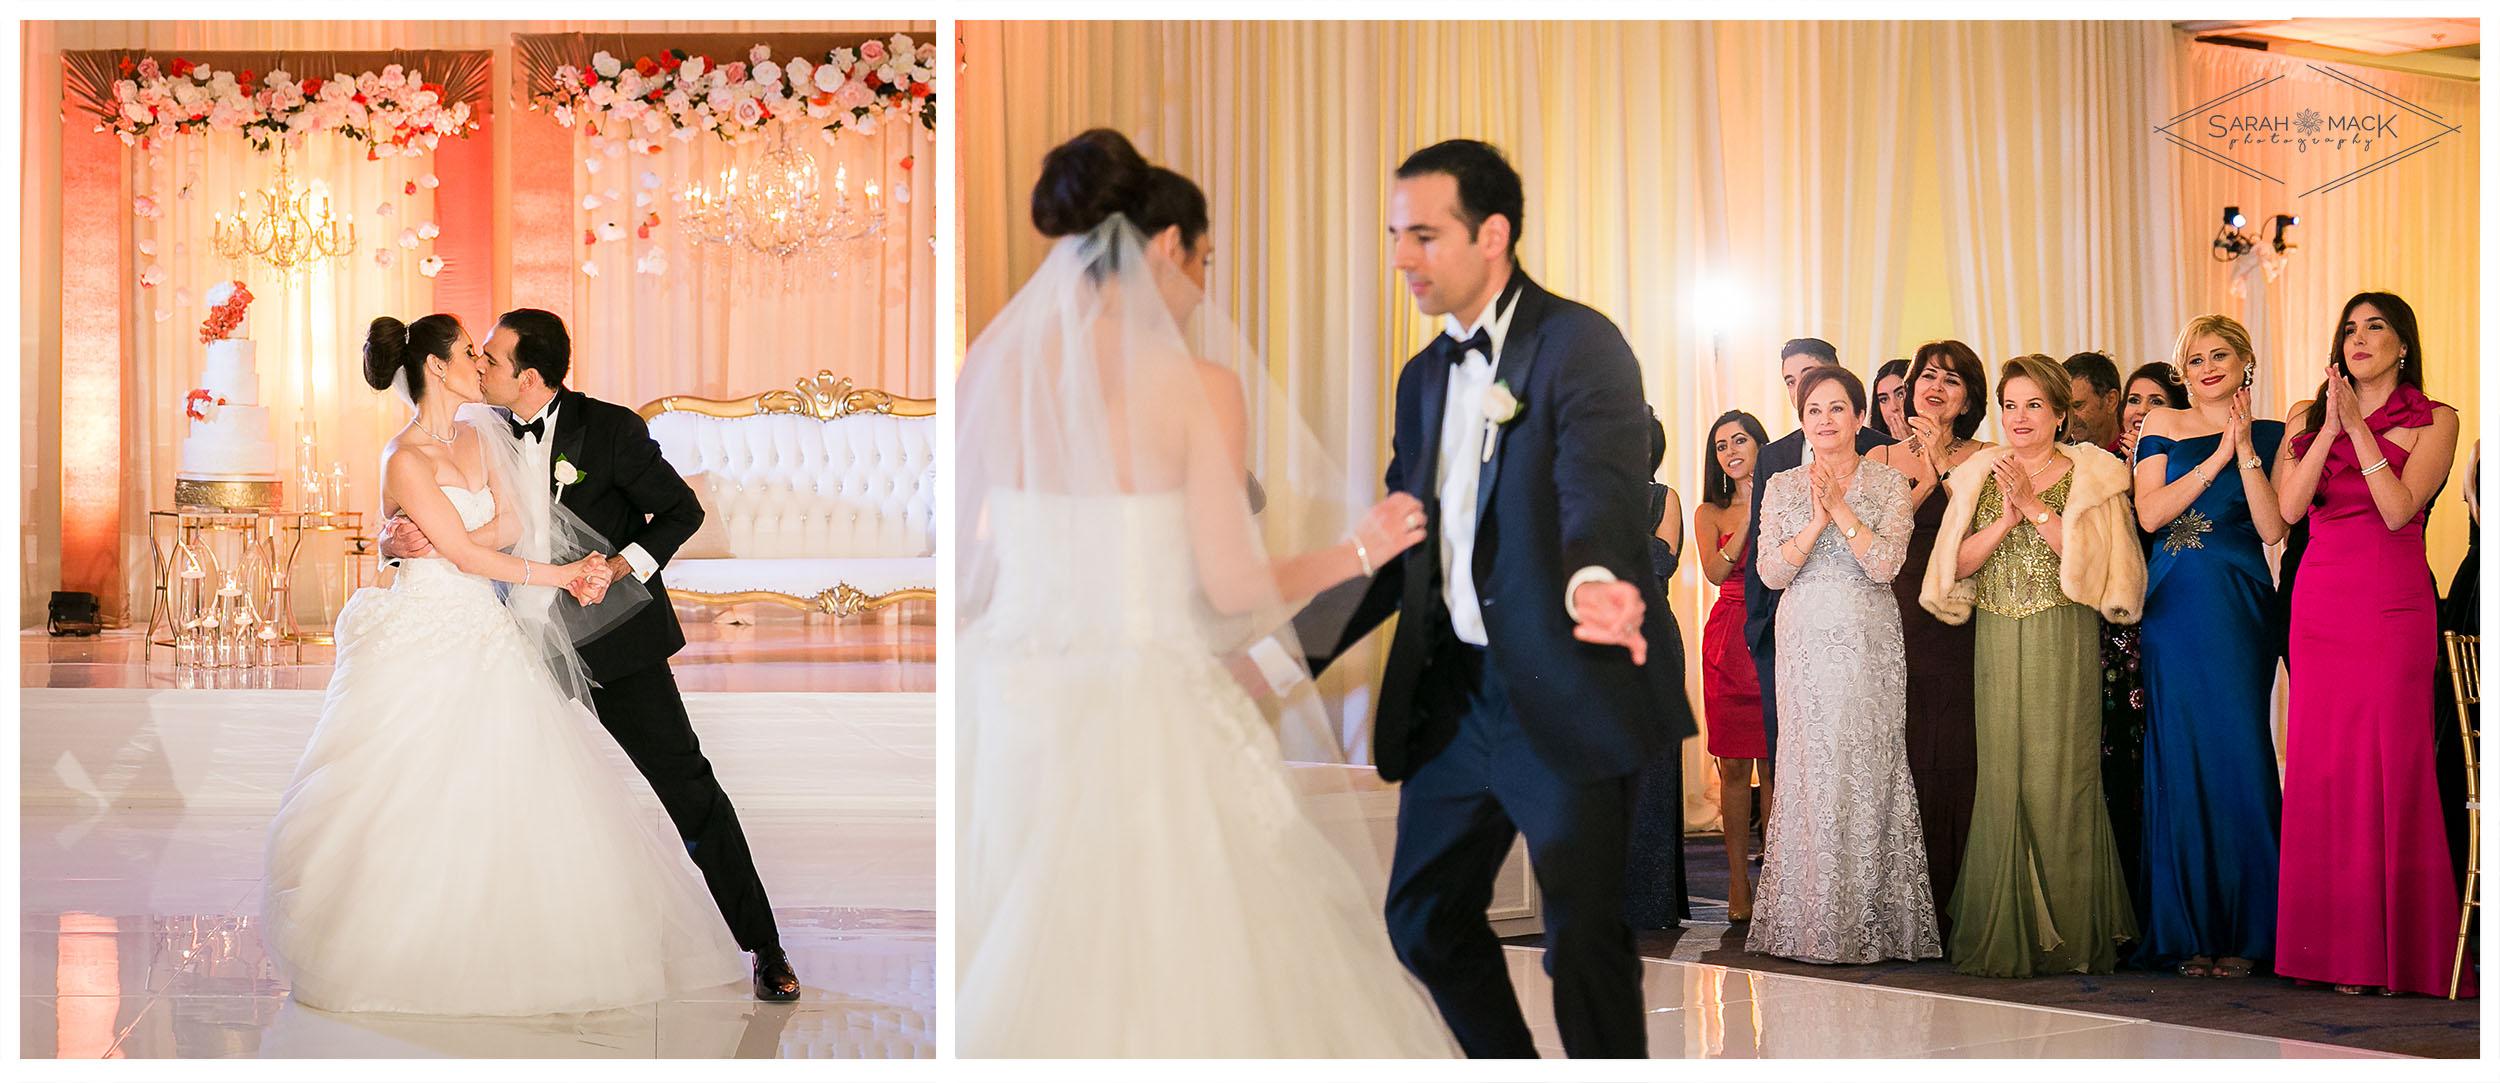 NJ-Newport-Beach-Marriott-Persian-Wedding-40.jpg